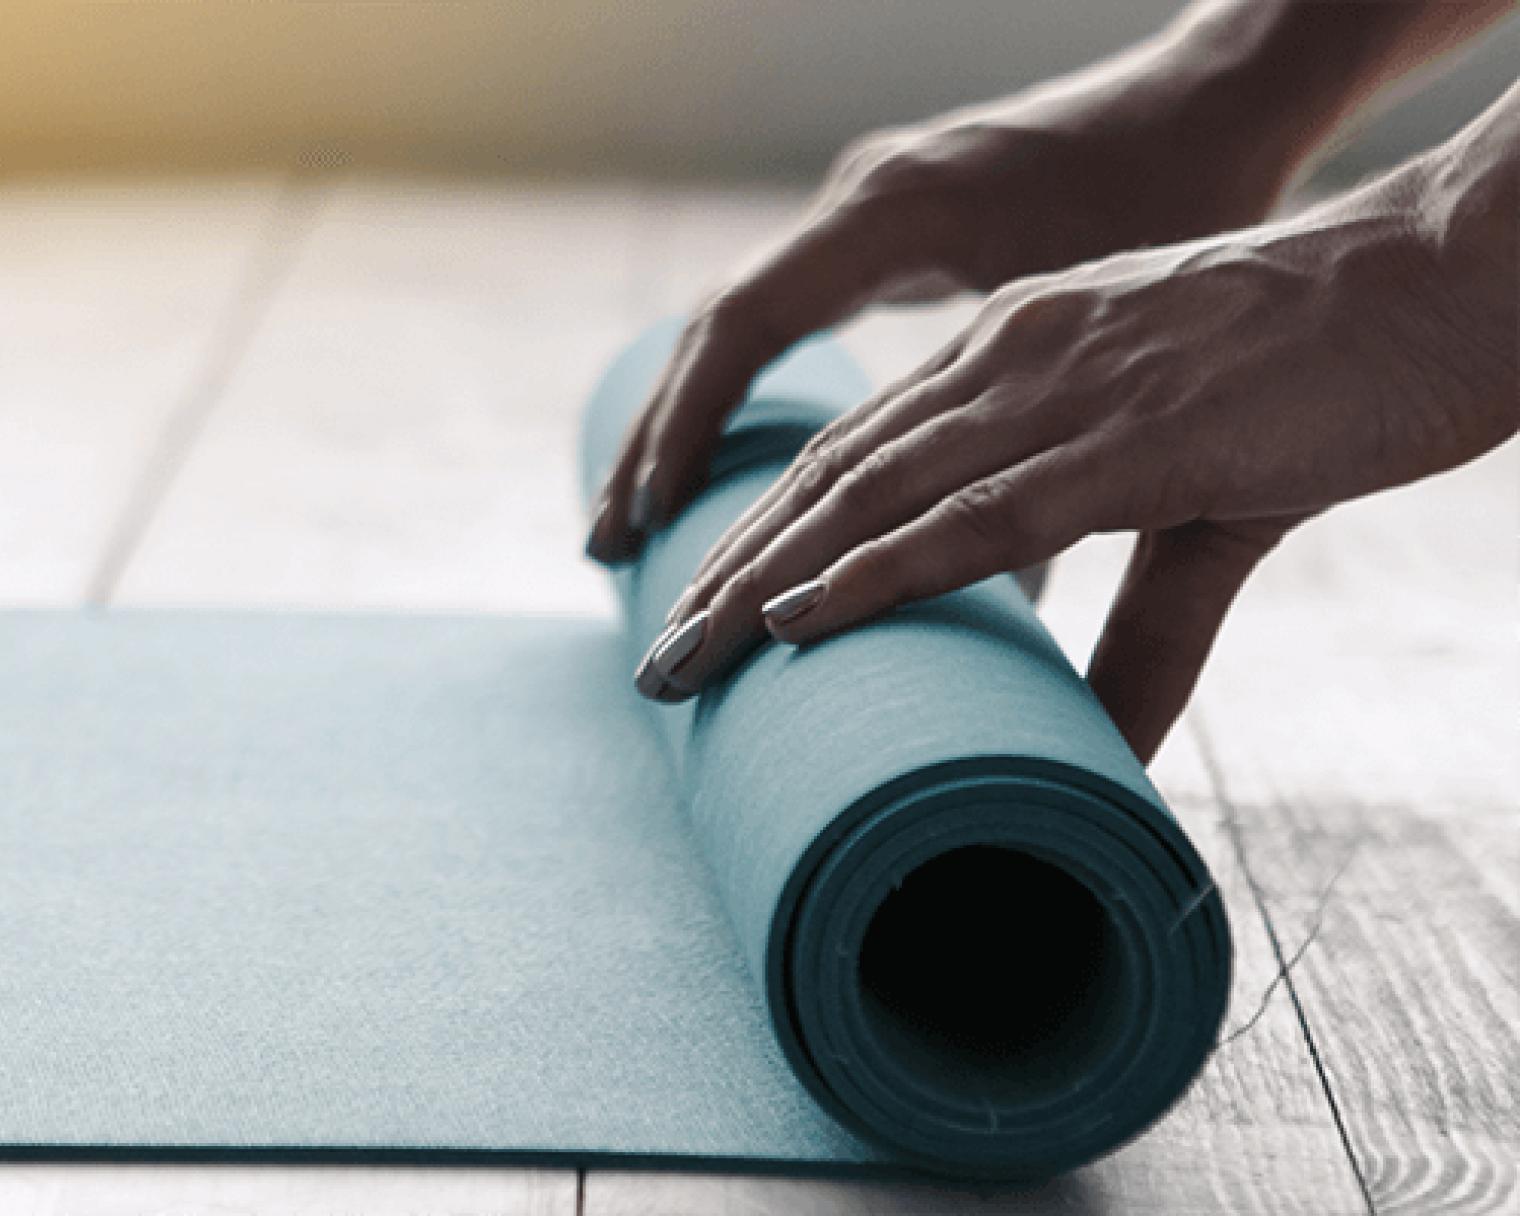 Hands rolling a yoga mat